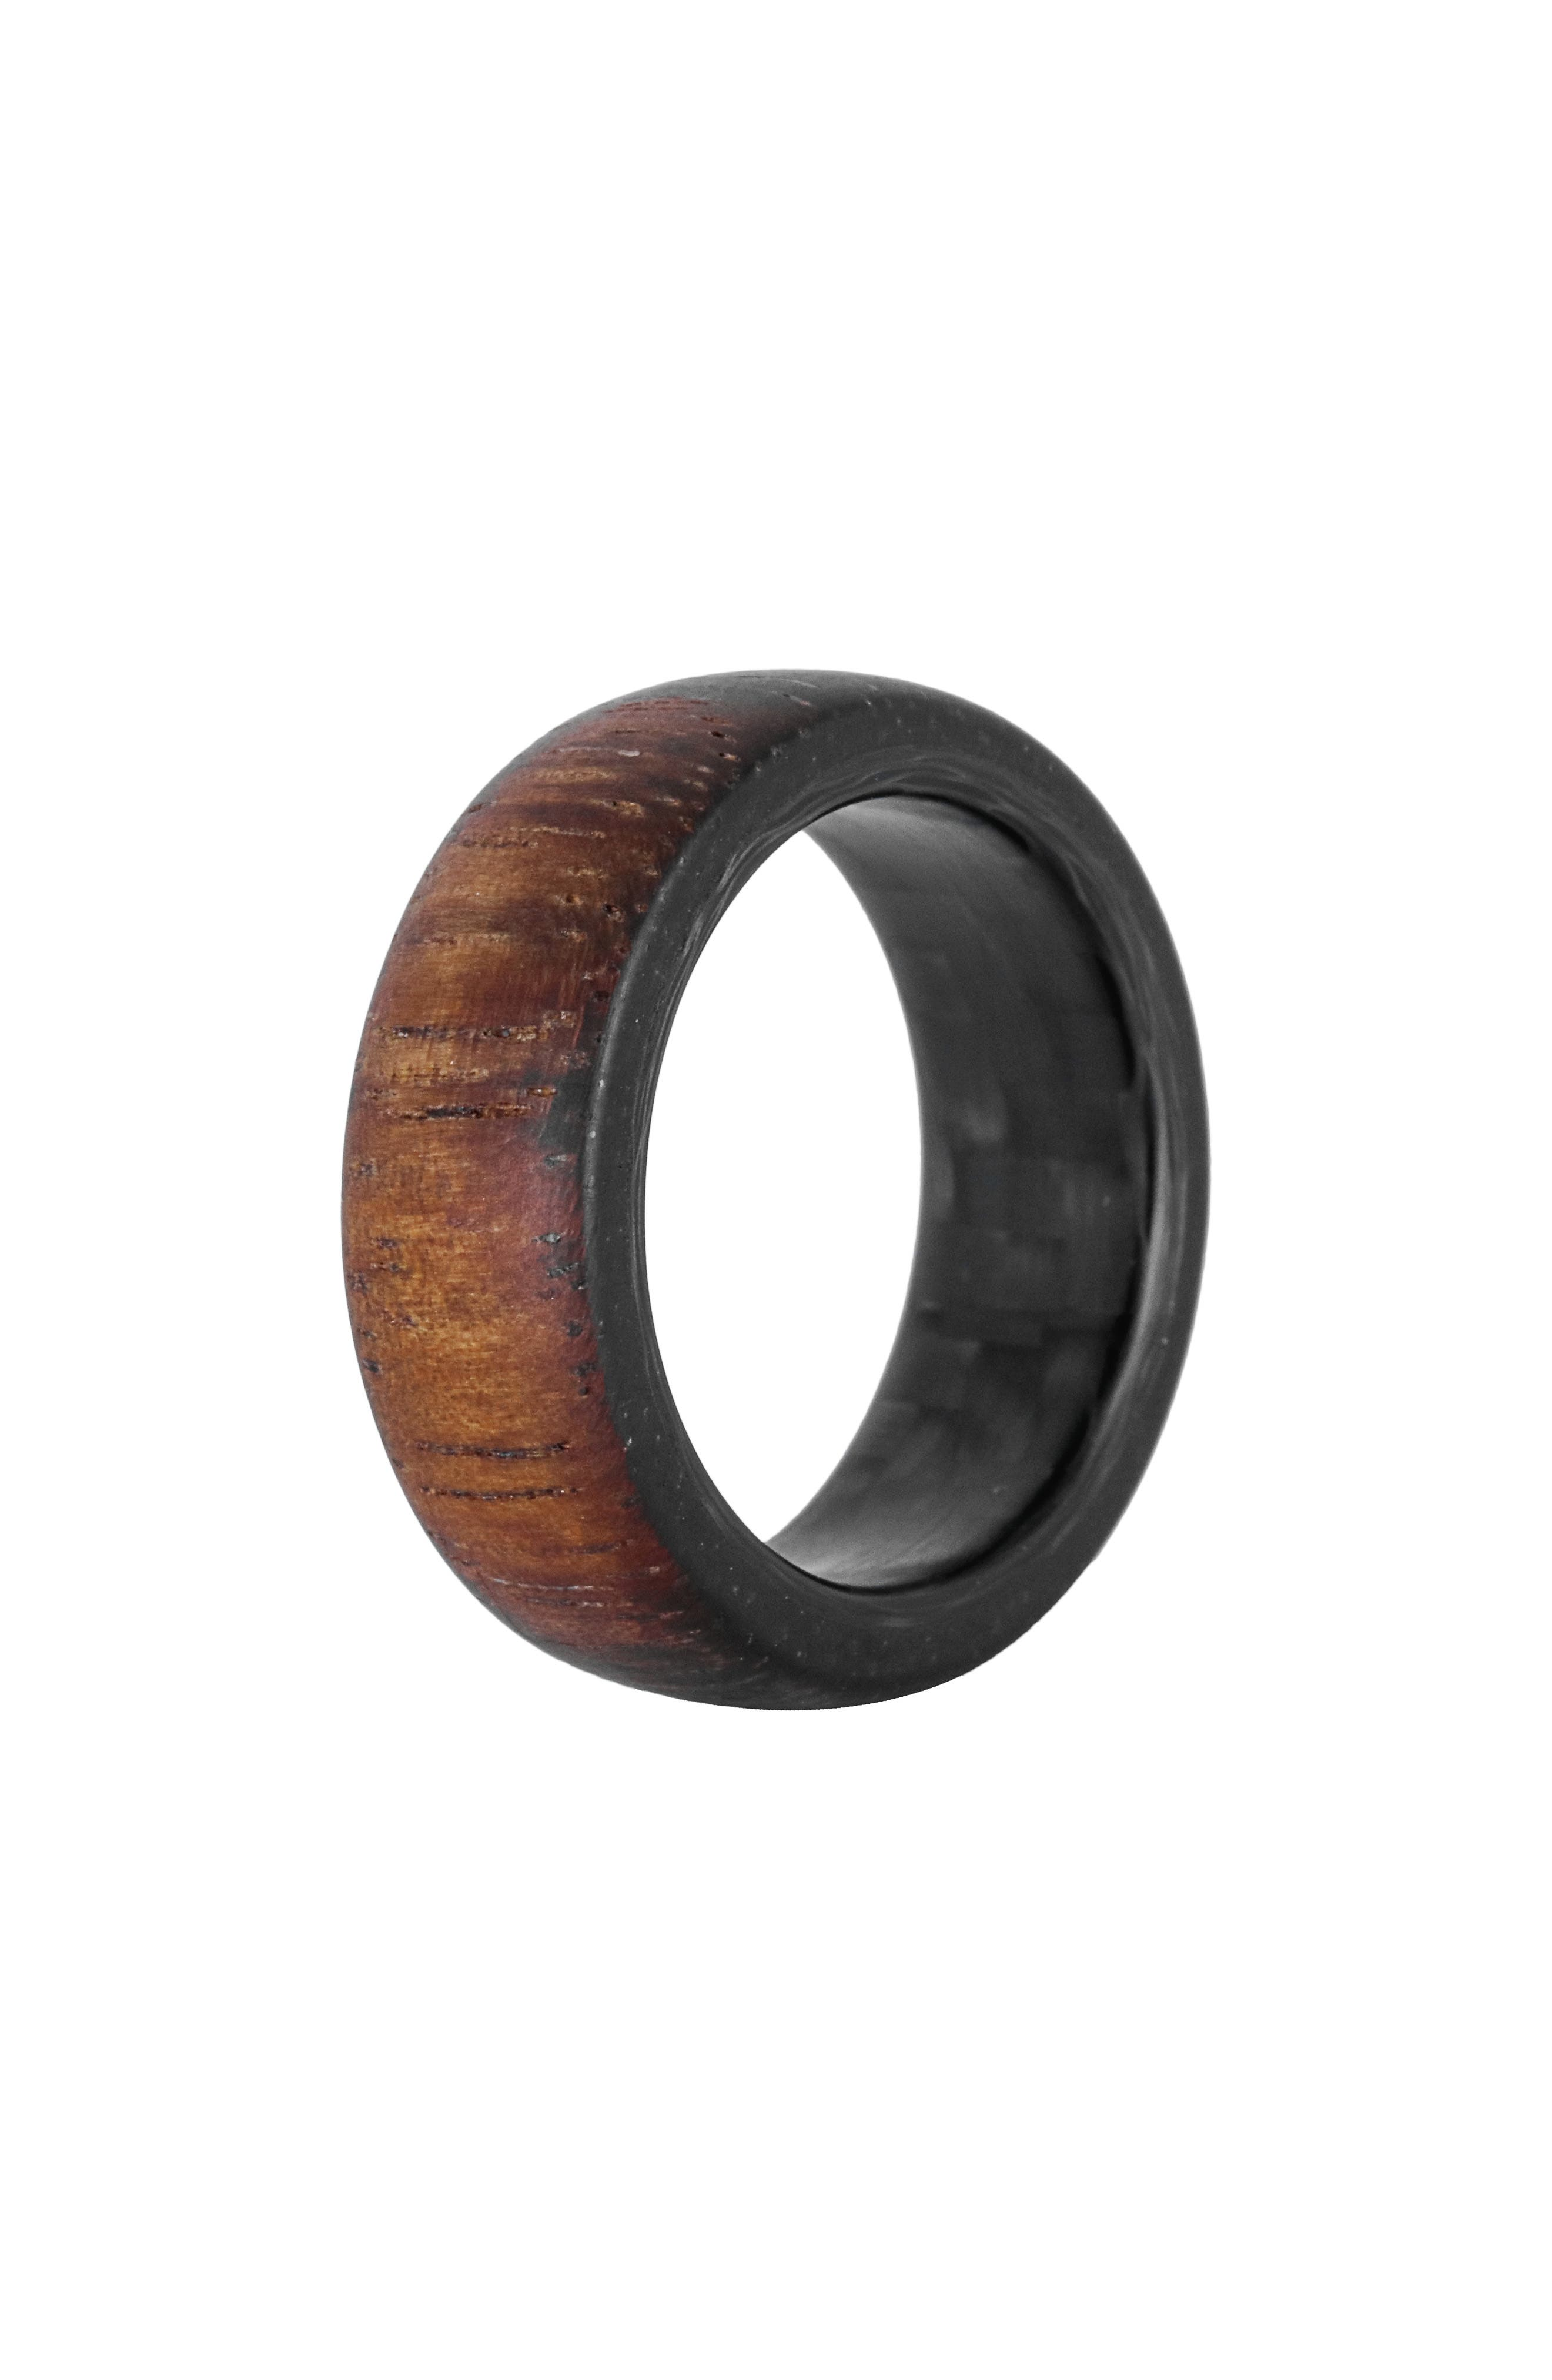 Koa Wood & Carbon Fiber Ring